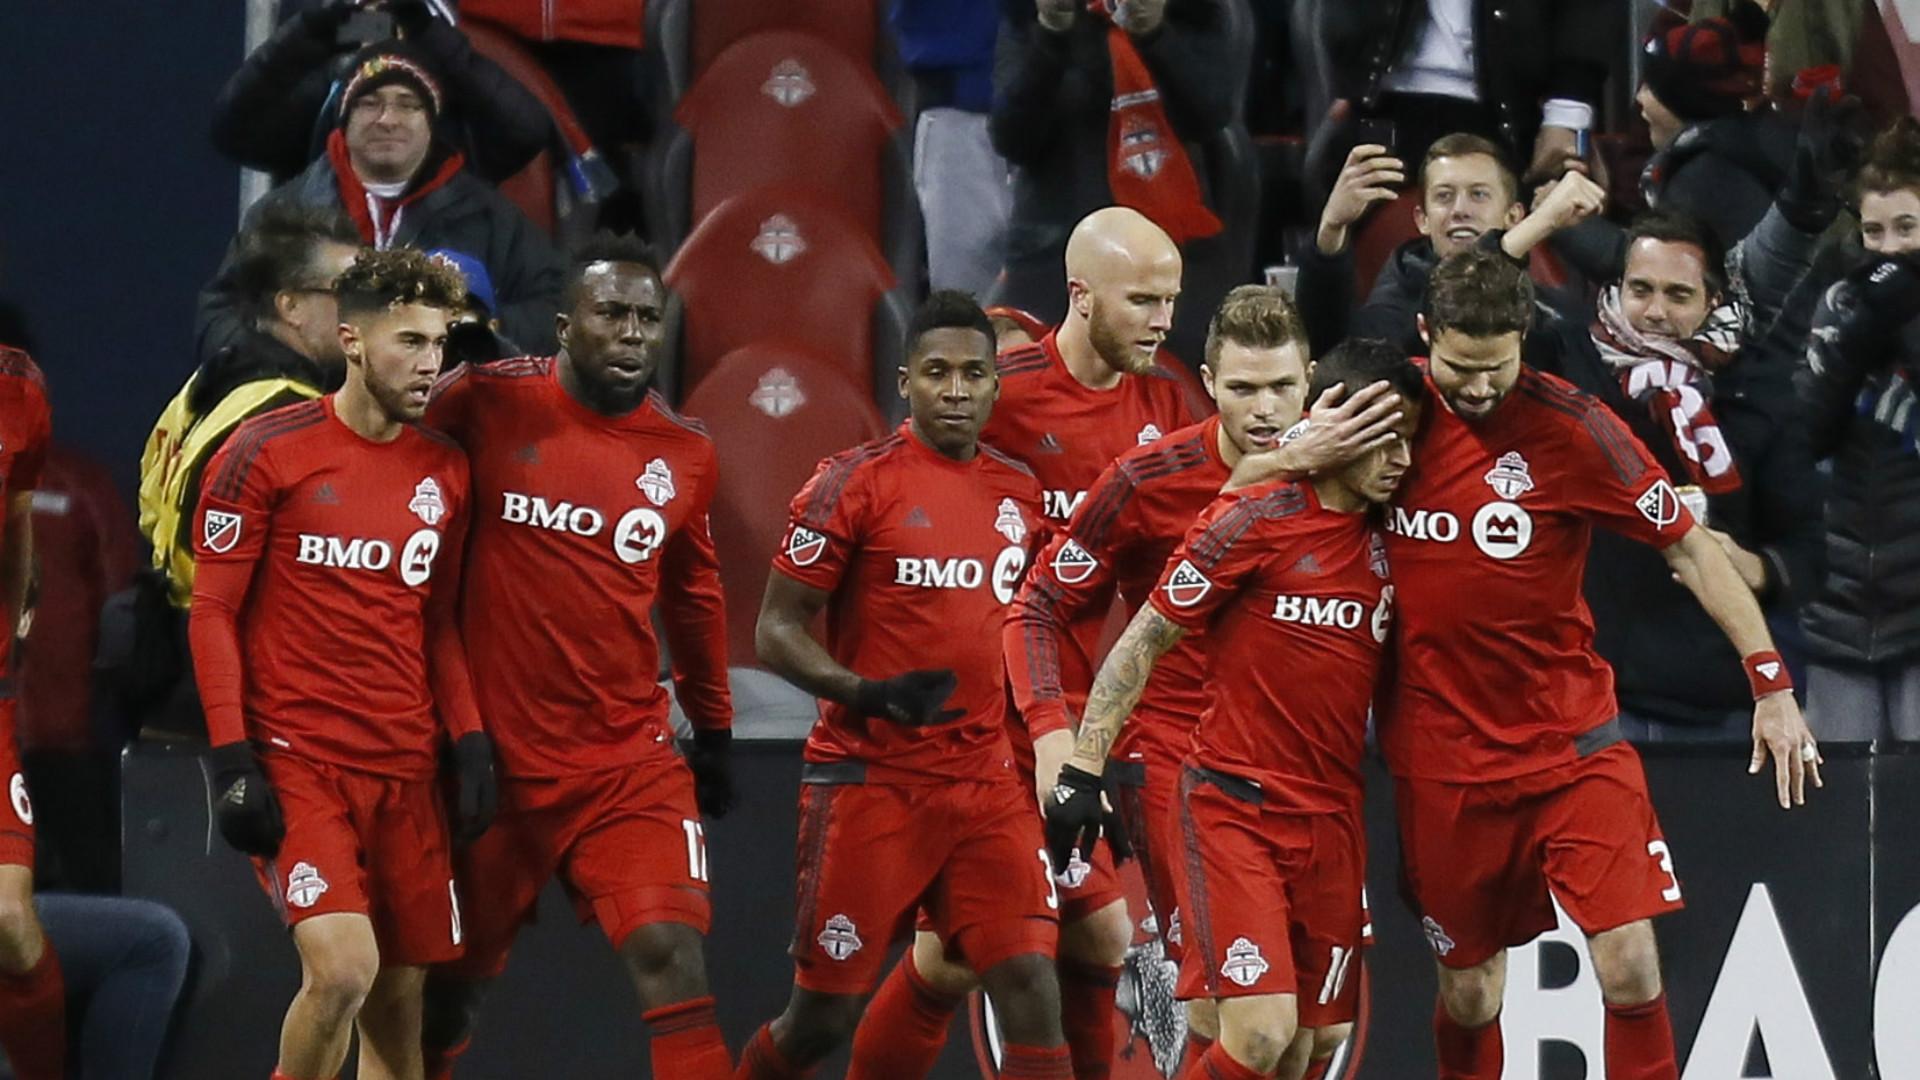 Toronto FC celebrates BMO Field 10262016